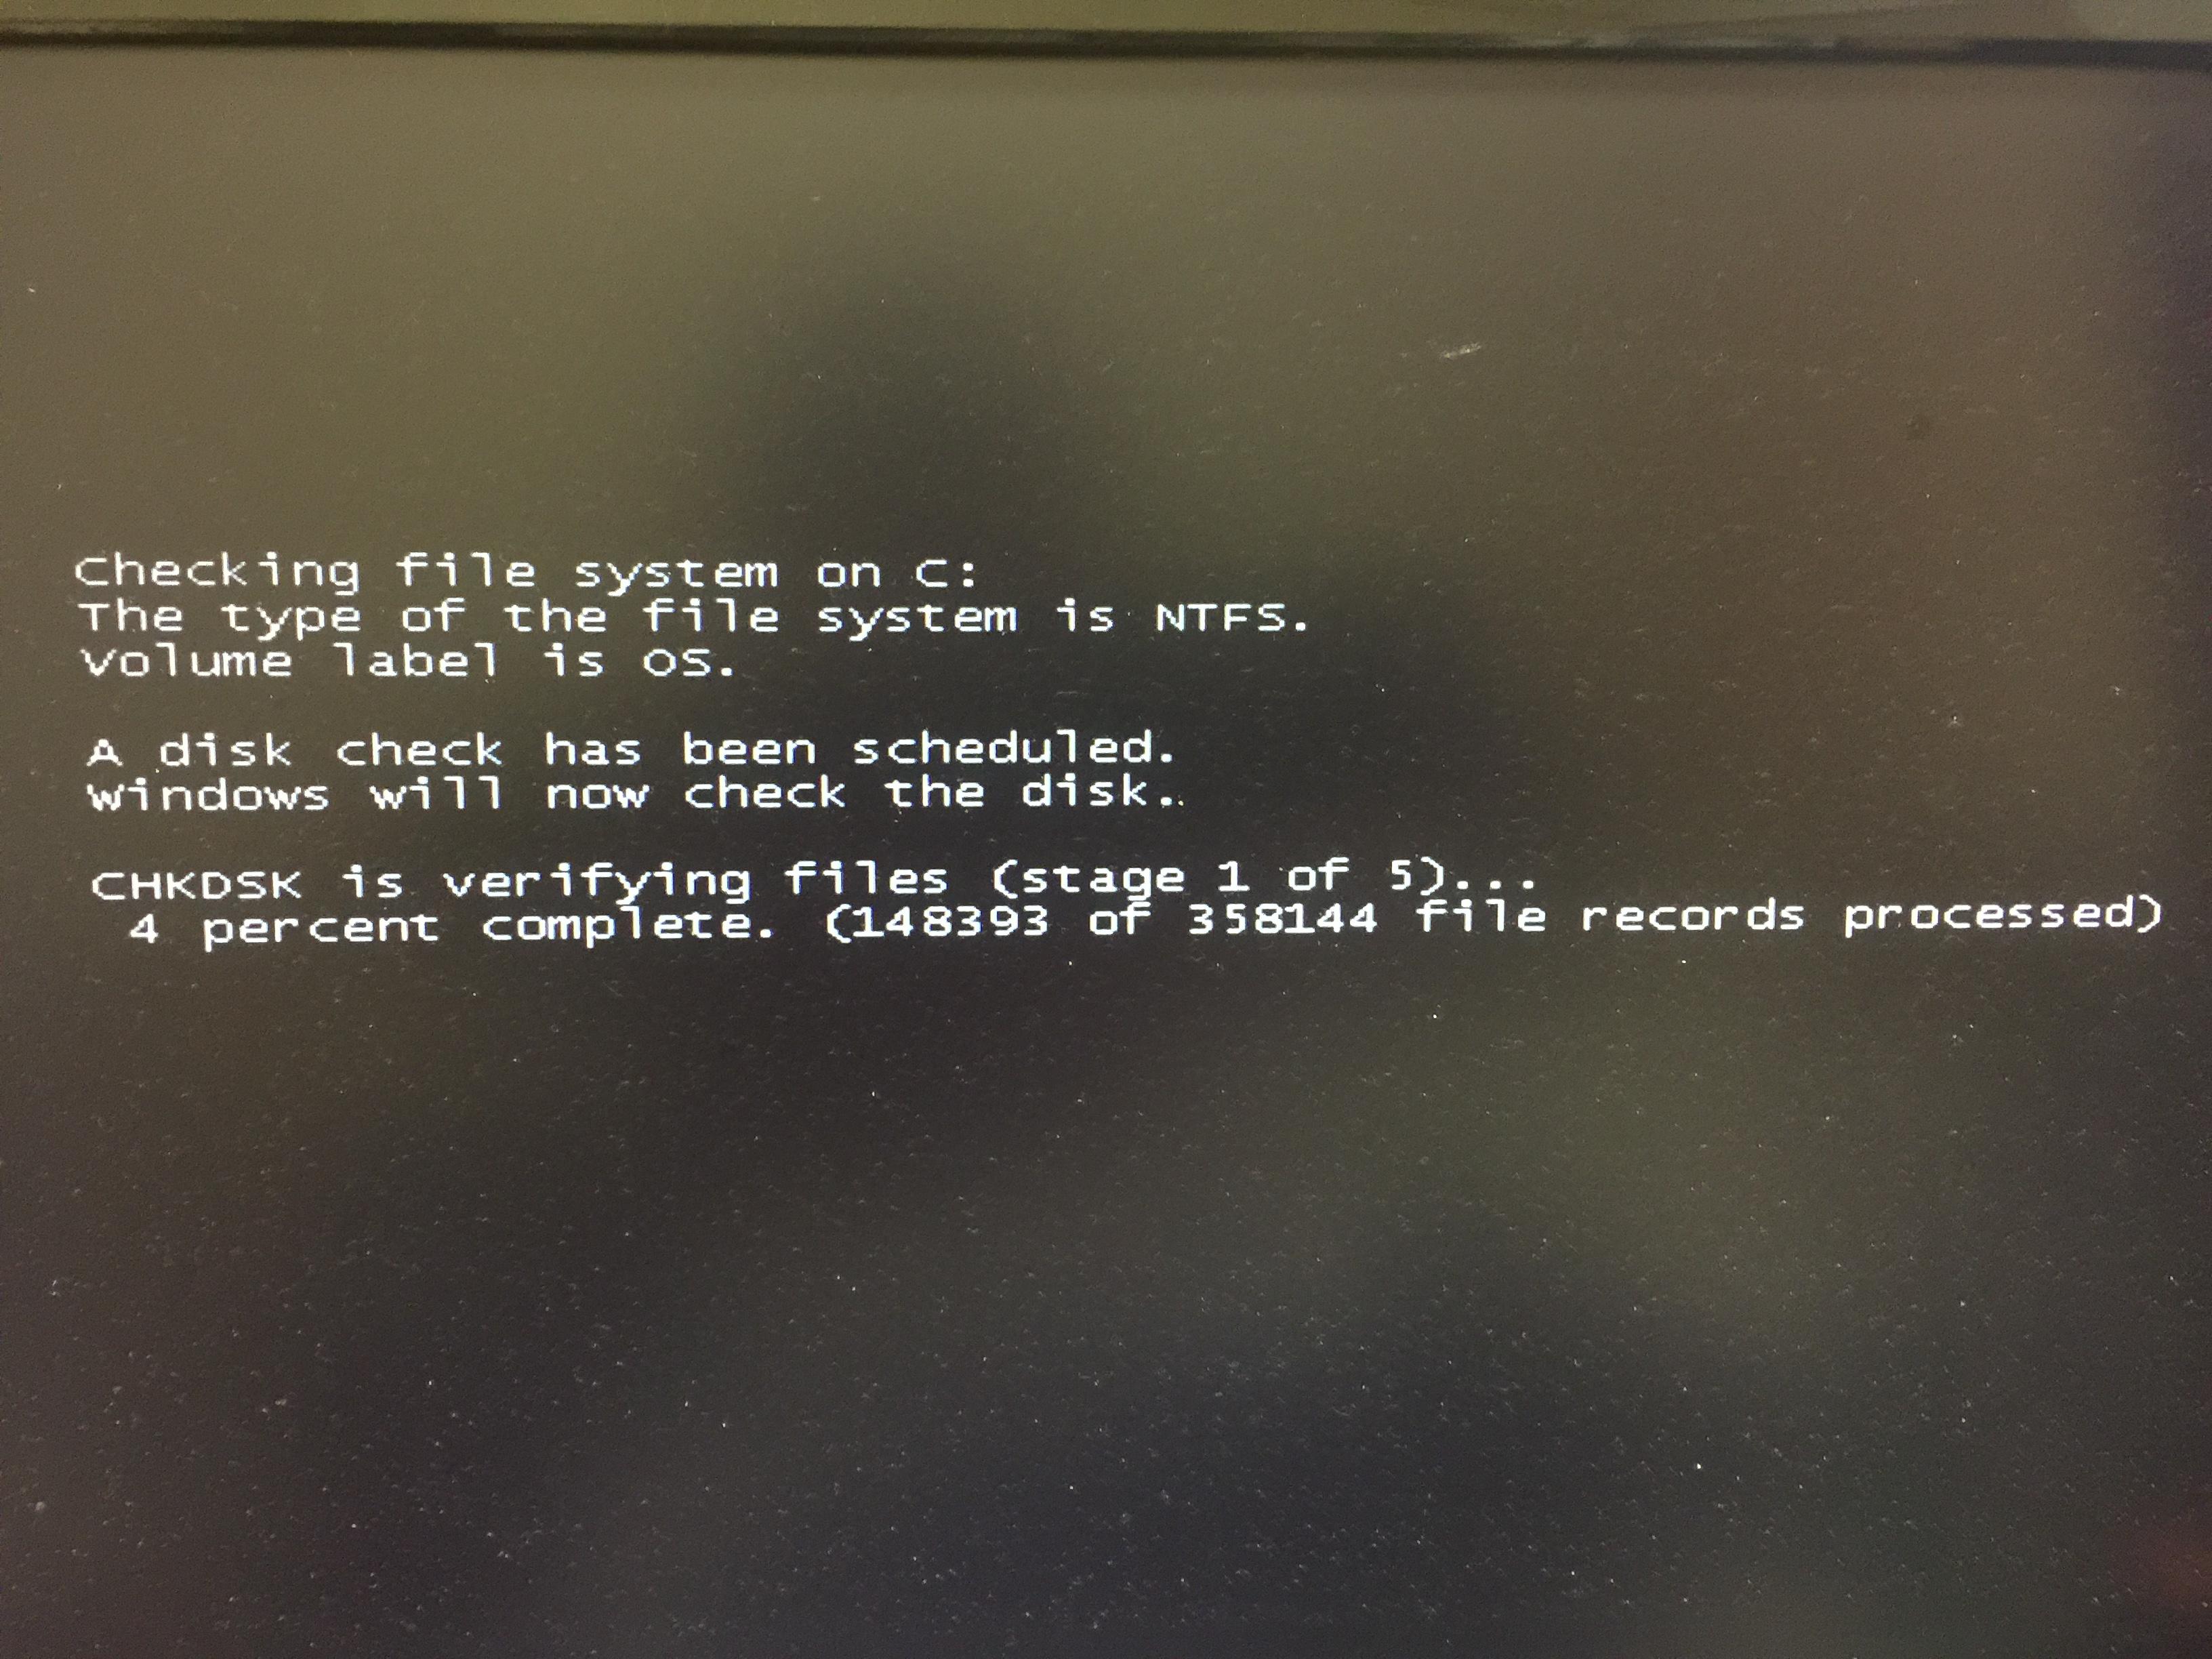 Windows7 チェックディスクの案内その8 再起動後の真っ黒な画面になりチェックが始まるので待機